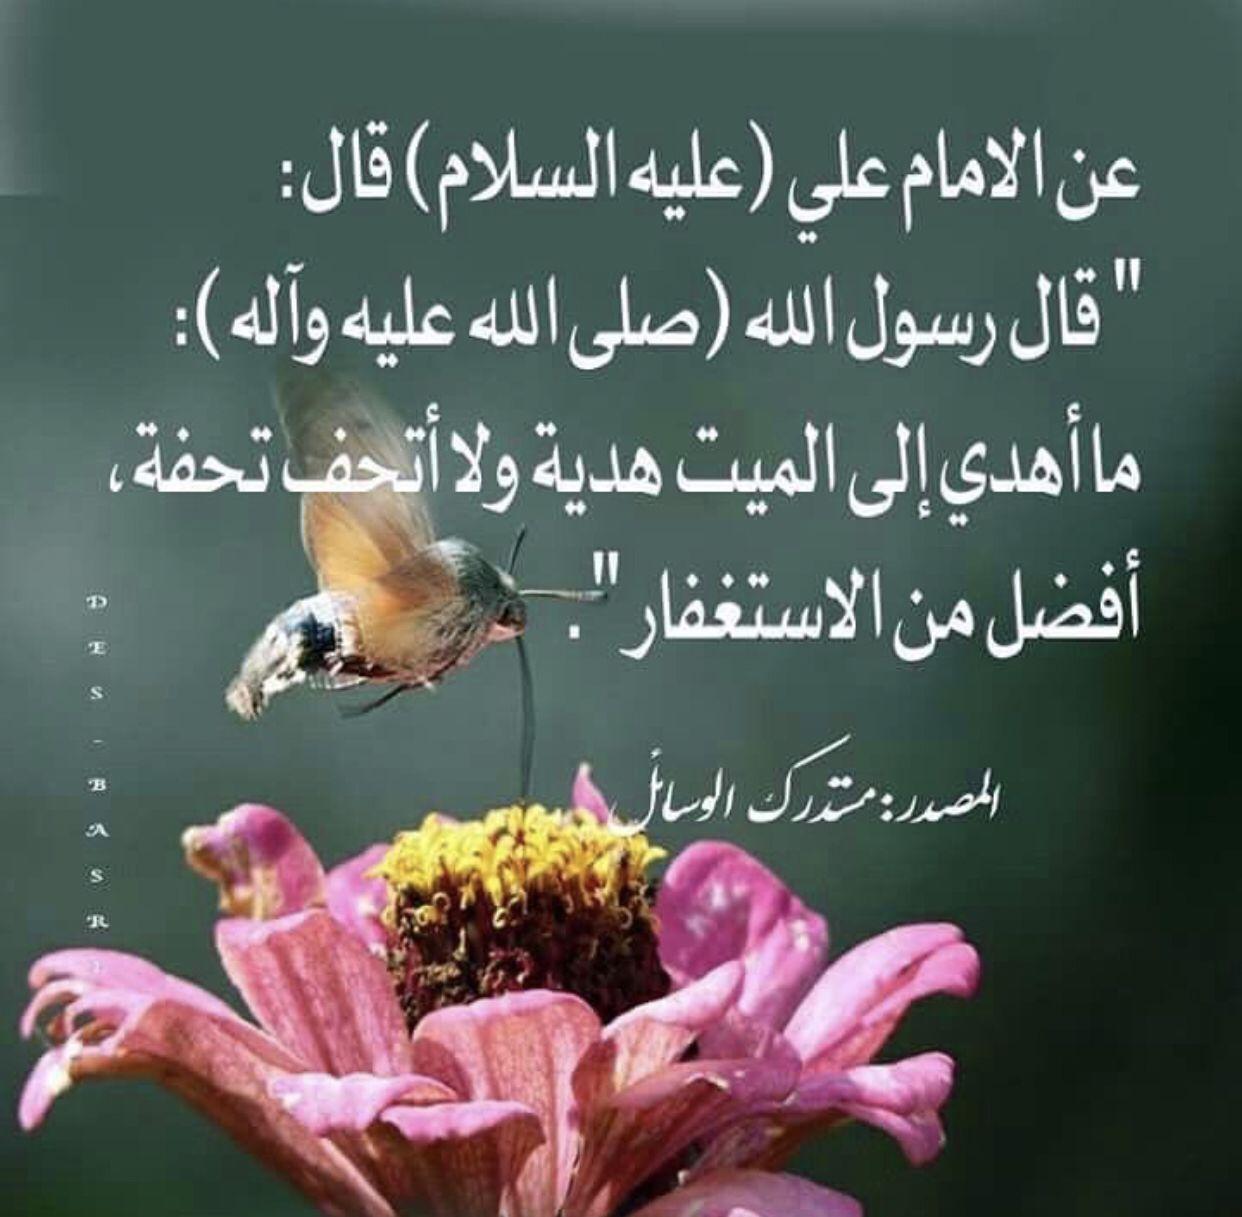 Pin By Abomohammad On احاديث ا هل الب يت ص Imam Ali Quotes Ali Quotes Islamic Phrases